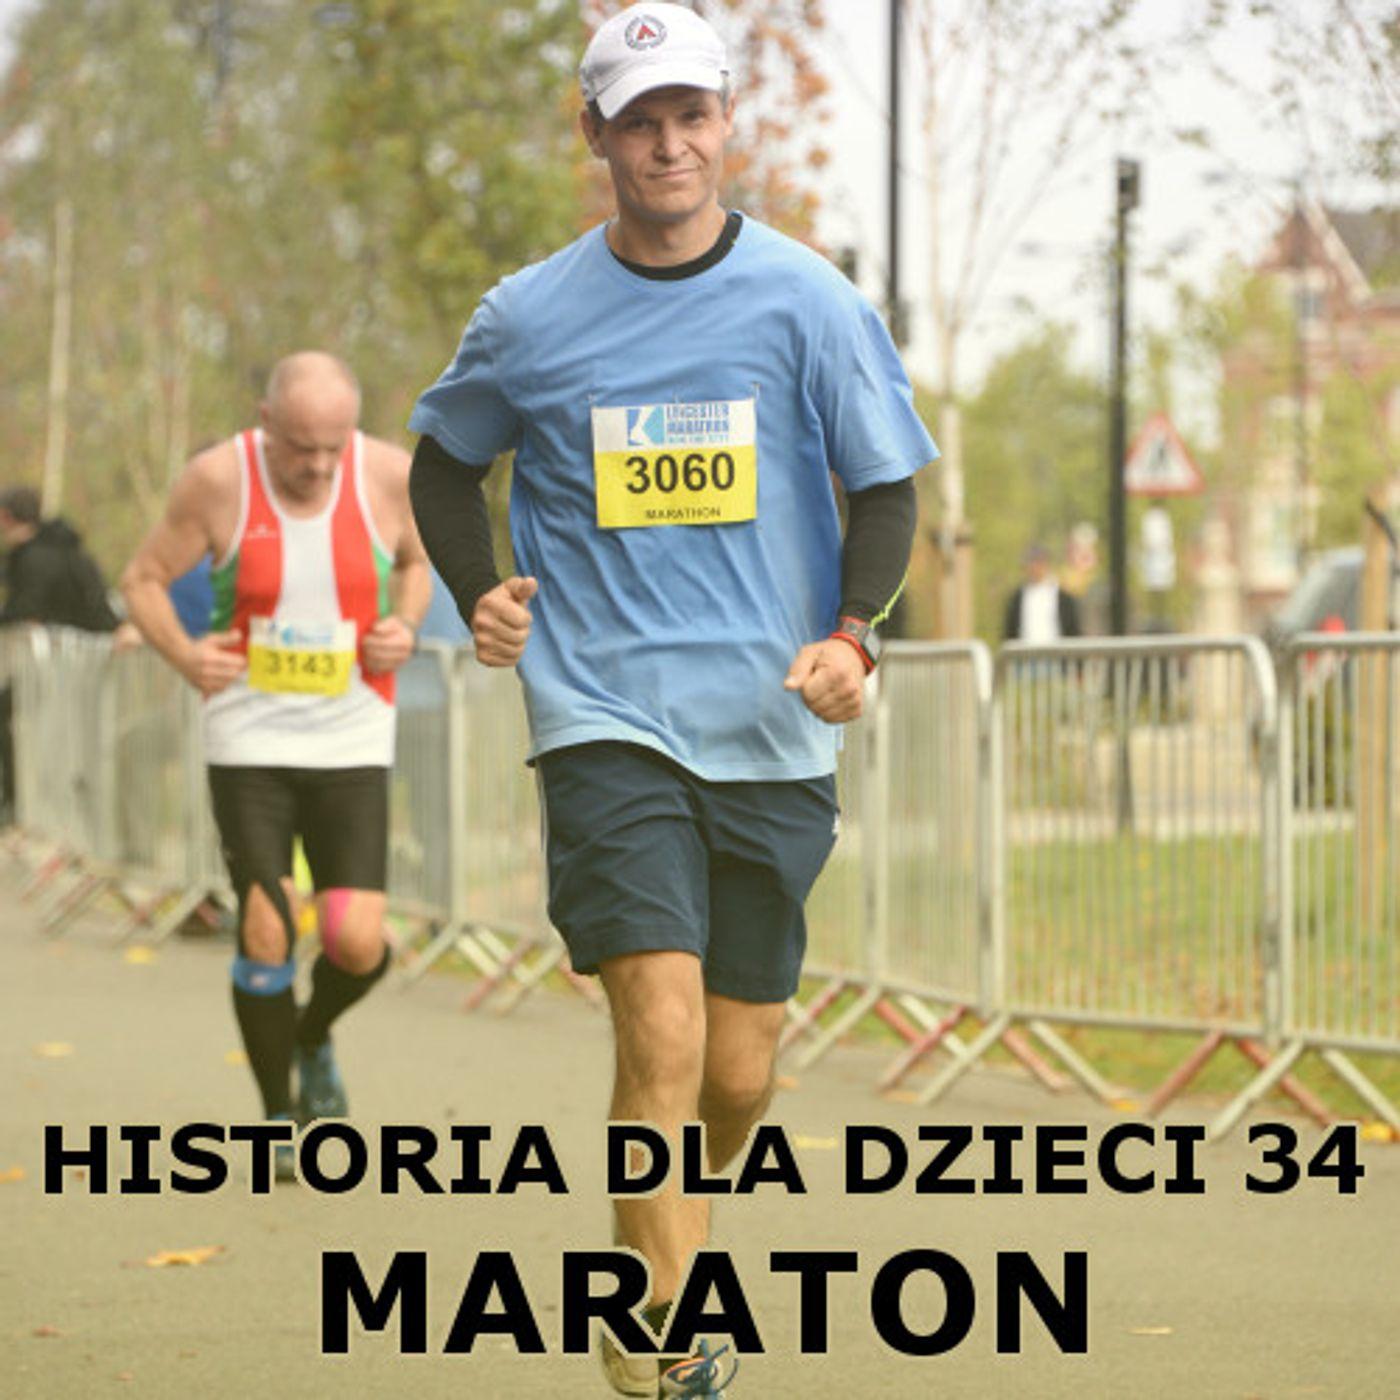 34 - Maraton